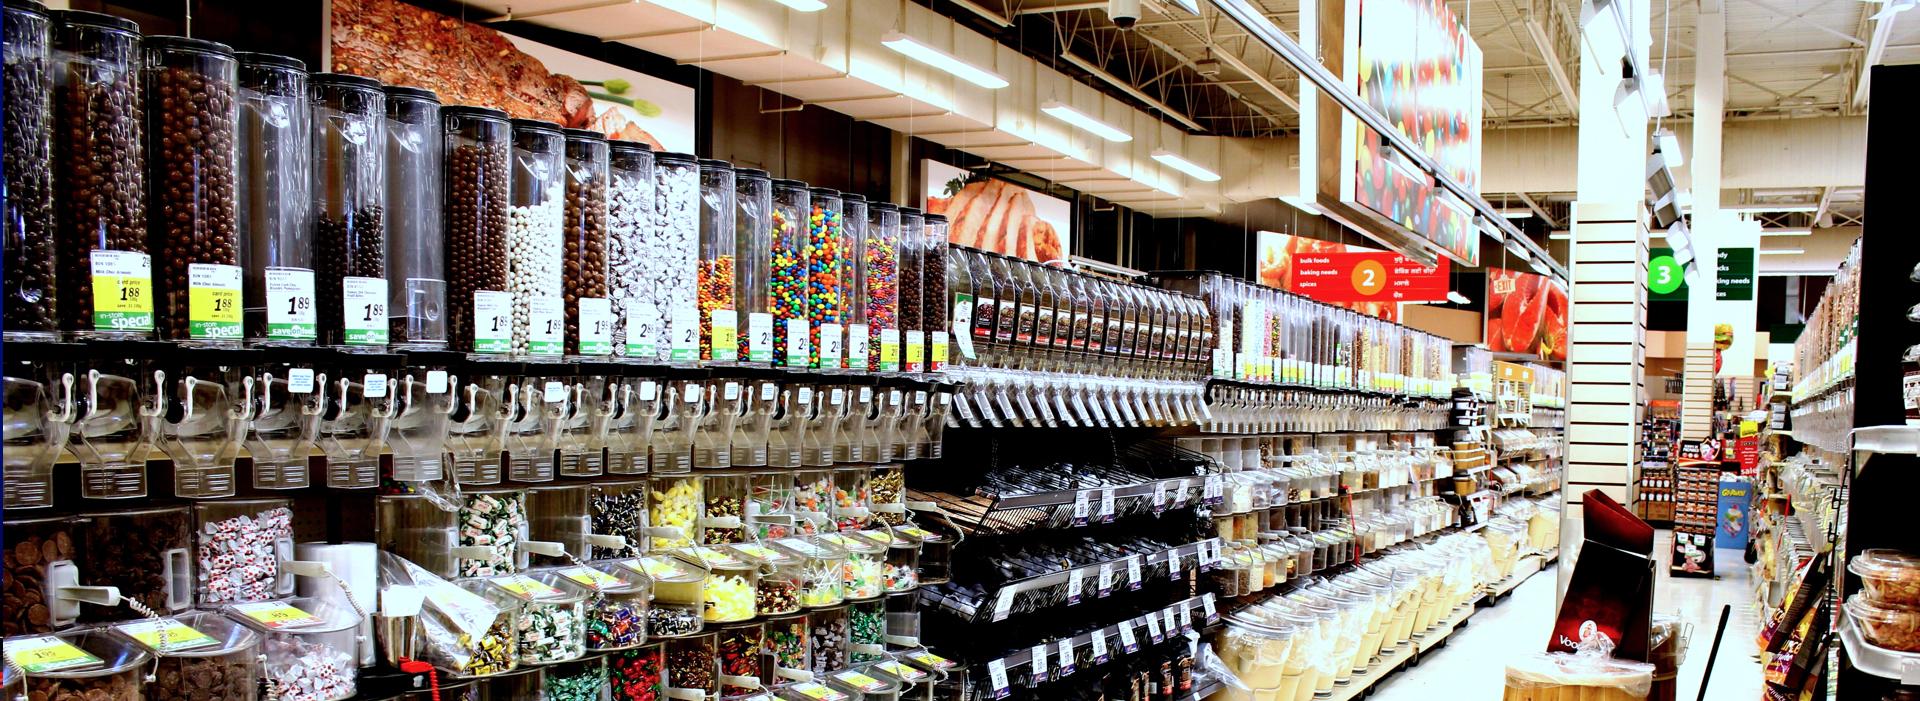 Groceries4_USGG.jpg